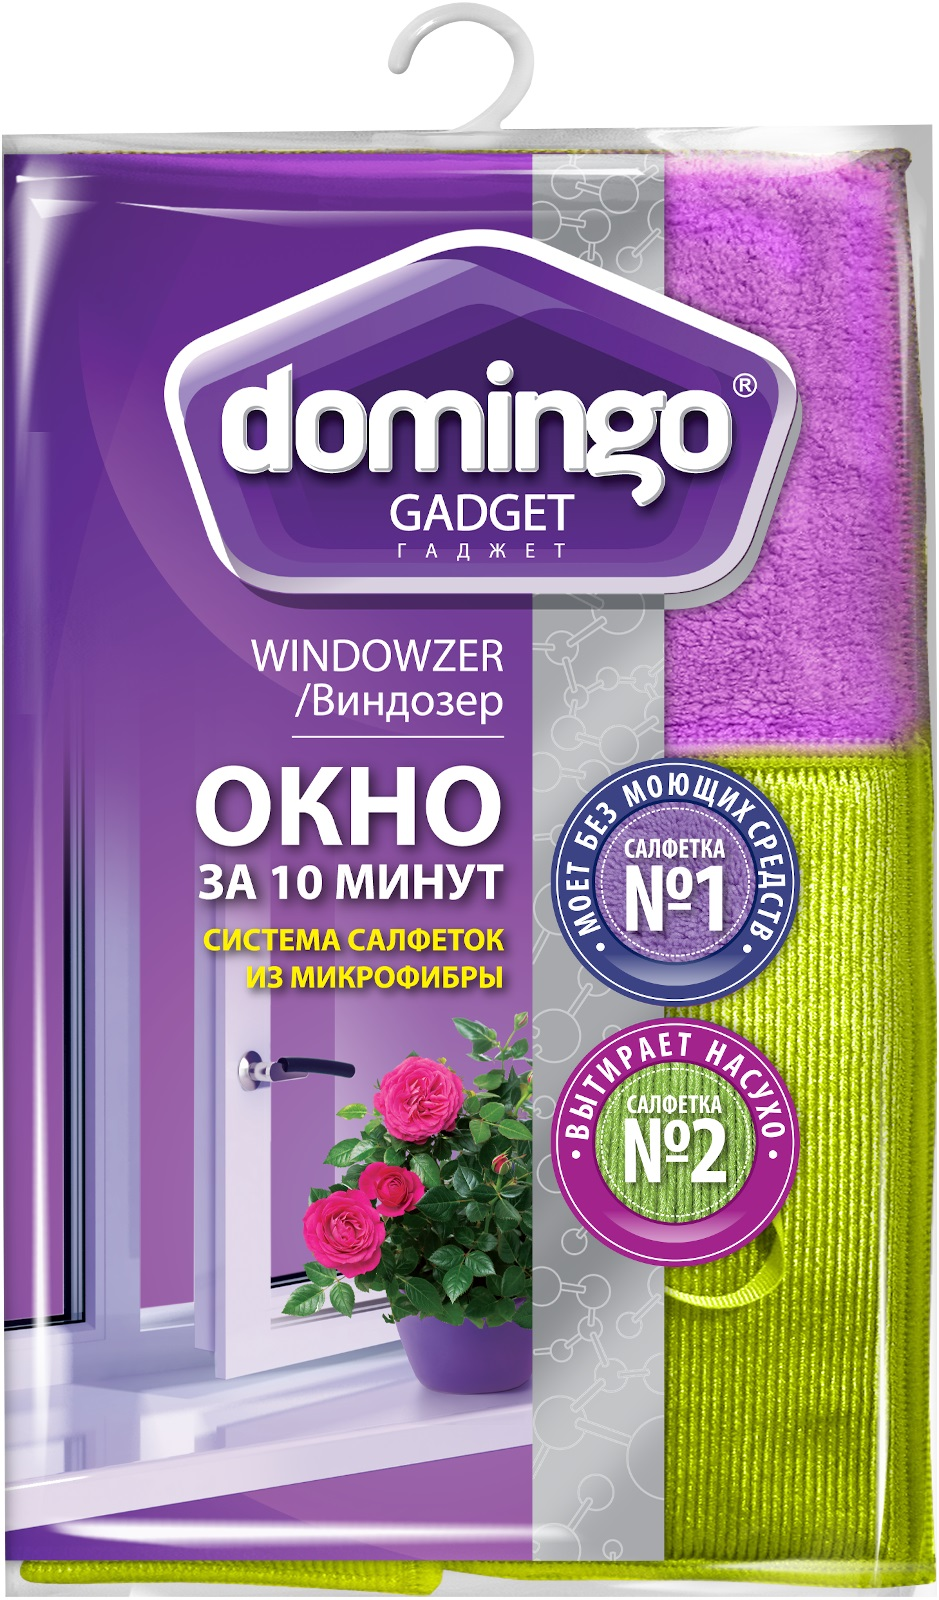 Миниатюра Салфетка для уборки Domingo Виндозер для мытья окон 20x25, 30x35 см 2 шт №1